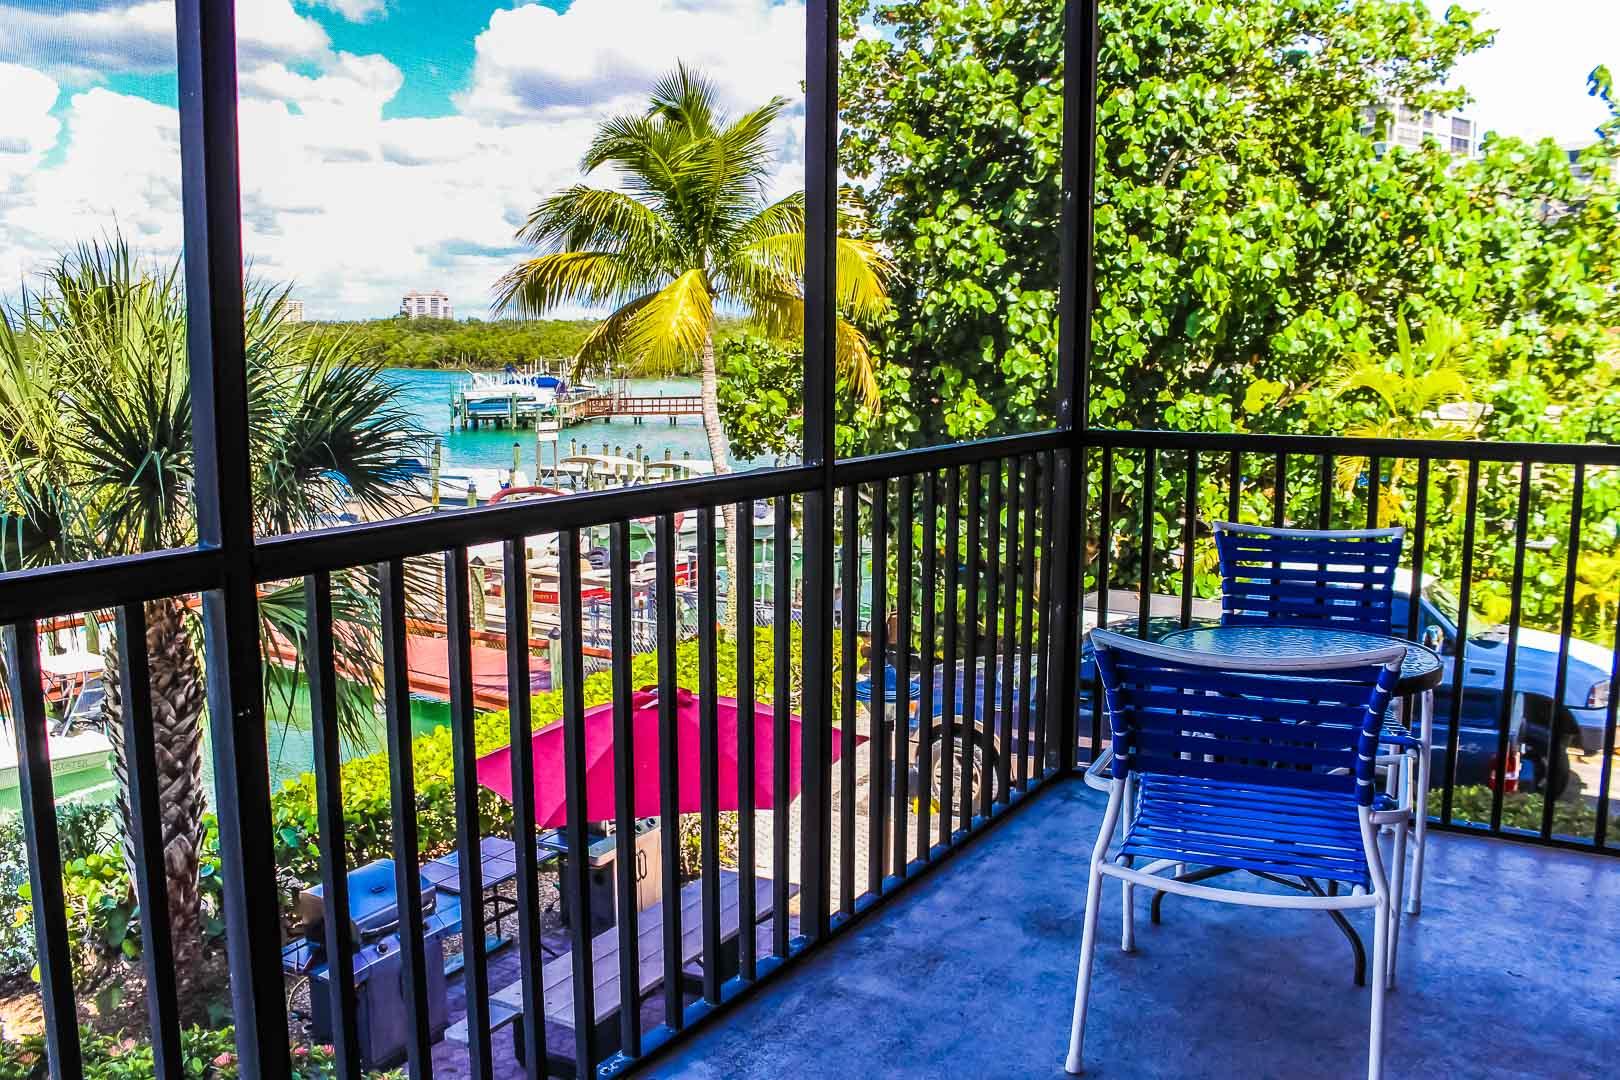 A vibrant balcony view at VRI's Bonita Resort and Club in Florida.